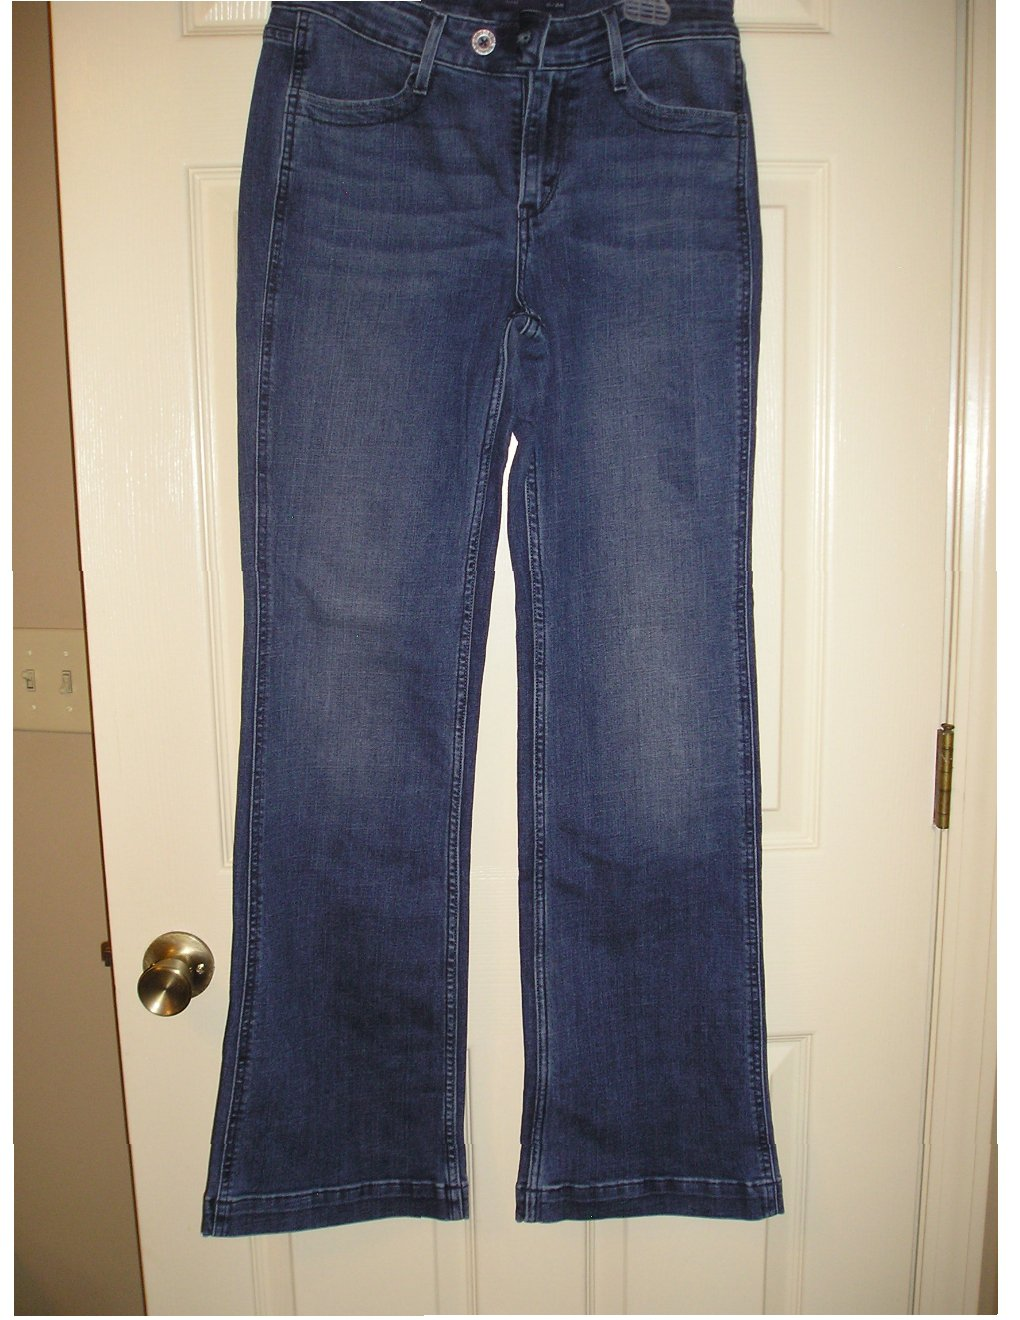 Womens Levi's Demi Curve Classic Flare Jeans Size 6/28 Dark Wash 31 Inseam NEW